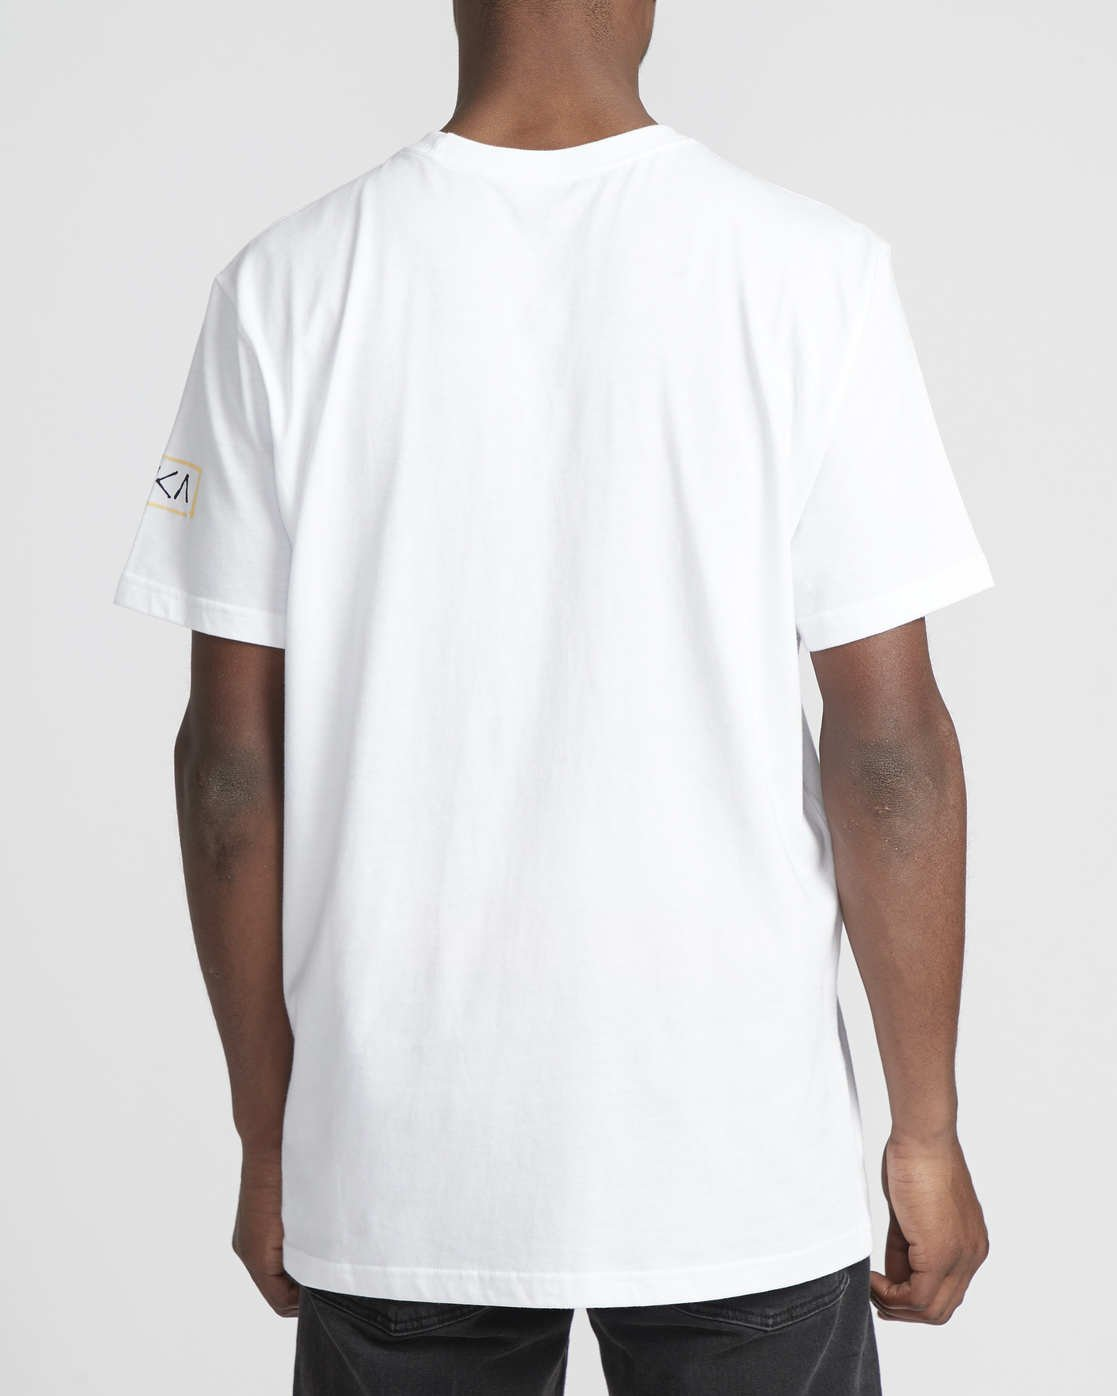 4 RVCA Blocker  - Short Sleeve T-Shirt White Q1SSSARVF9 RVCA